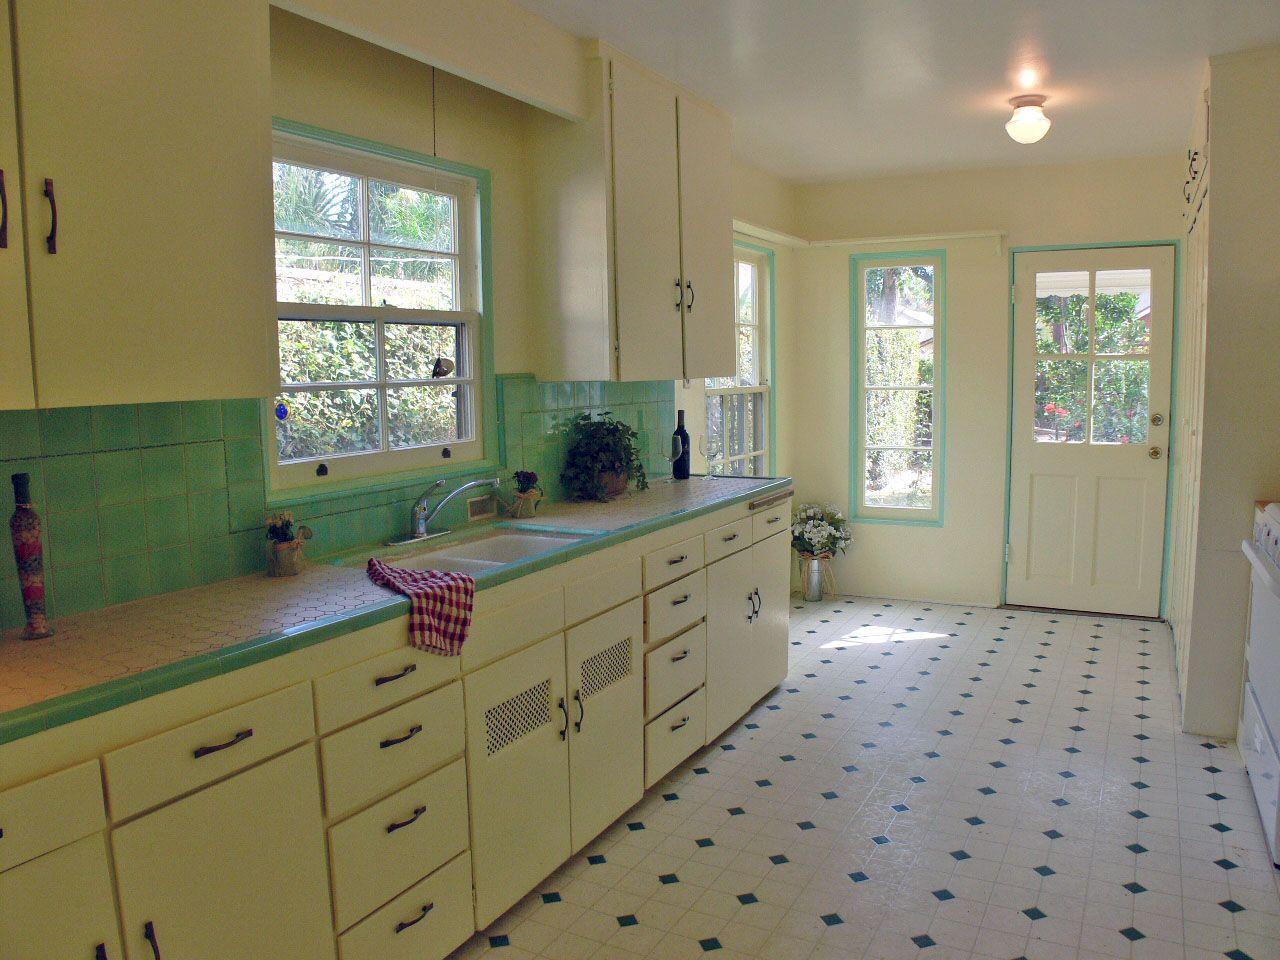 Pin by Alex Muniz on House stuff   Bathroom tile designs ...